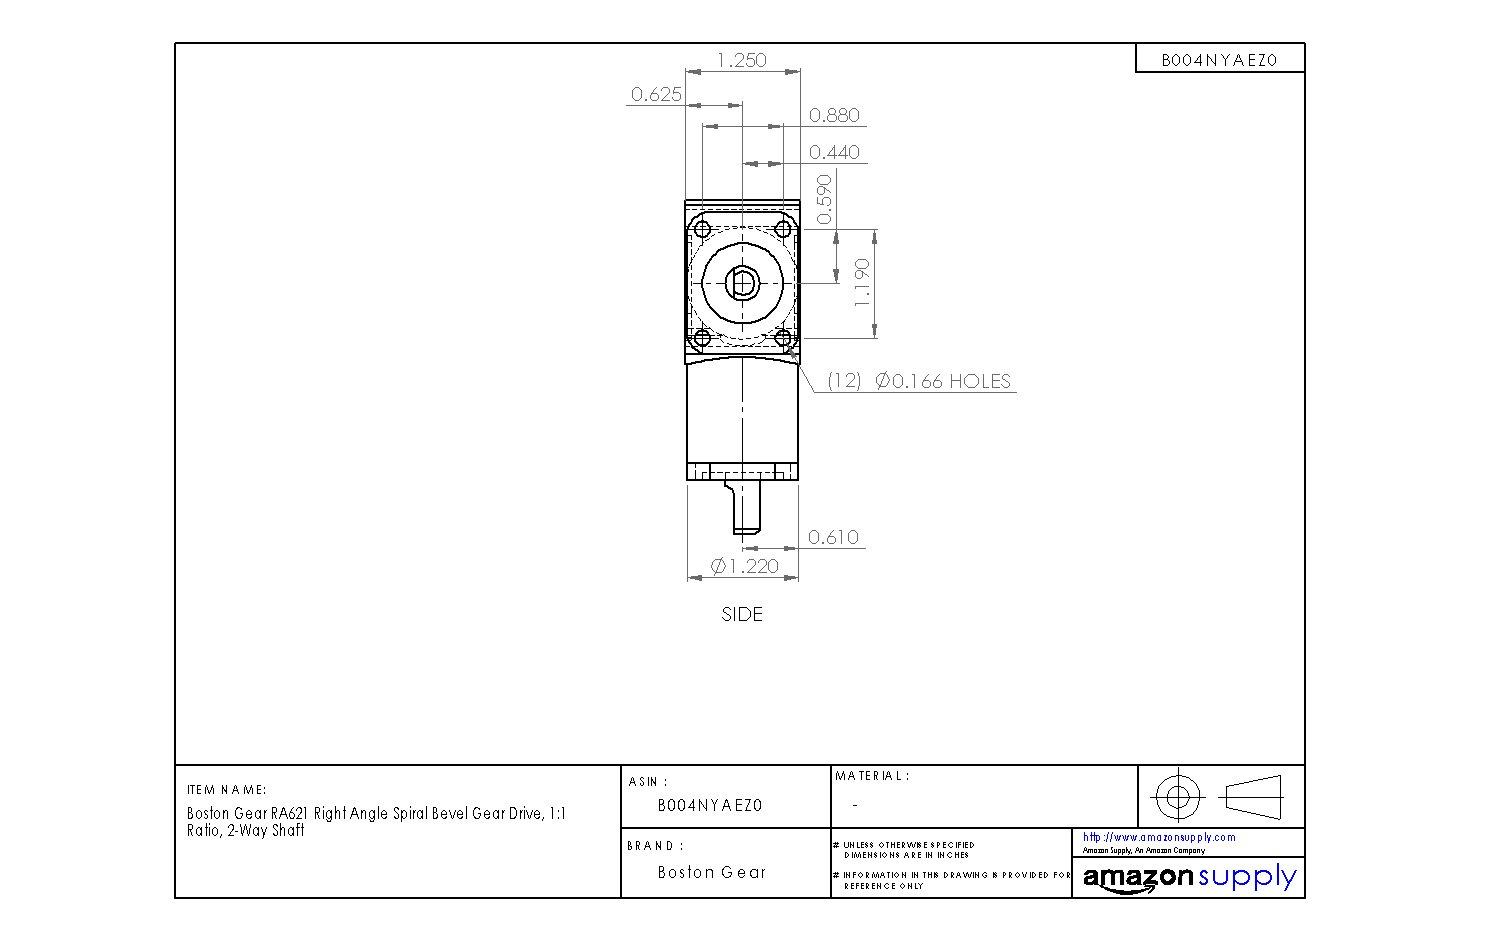 1:1 Ratio Boston Gear RA621 Right Angle Spiral Bevel Gear Drive 2-Way Shaft